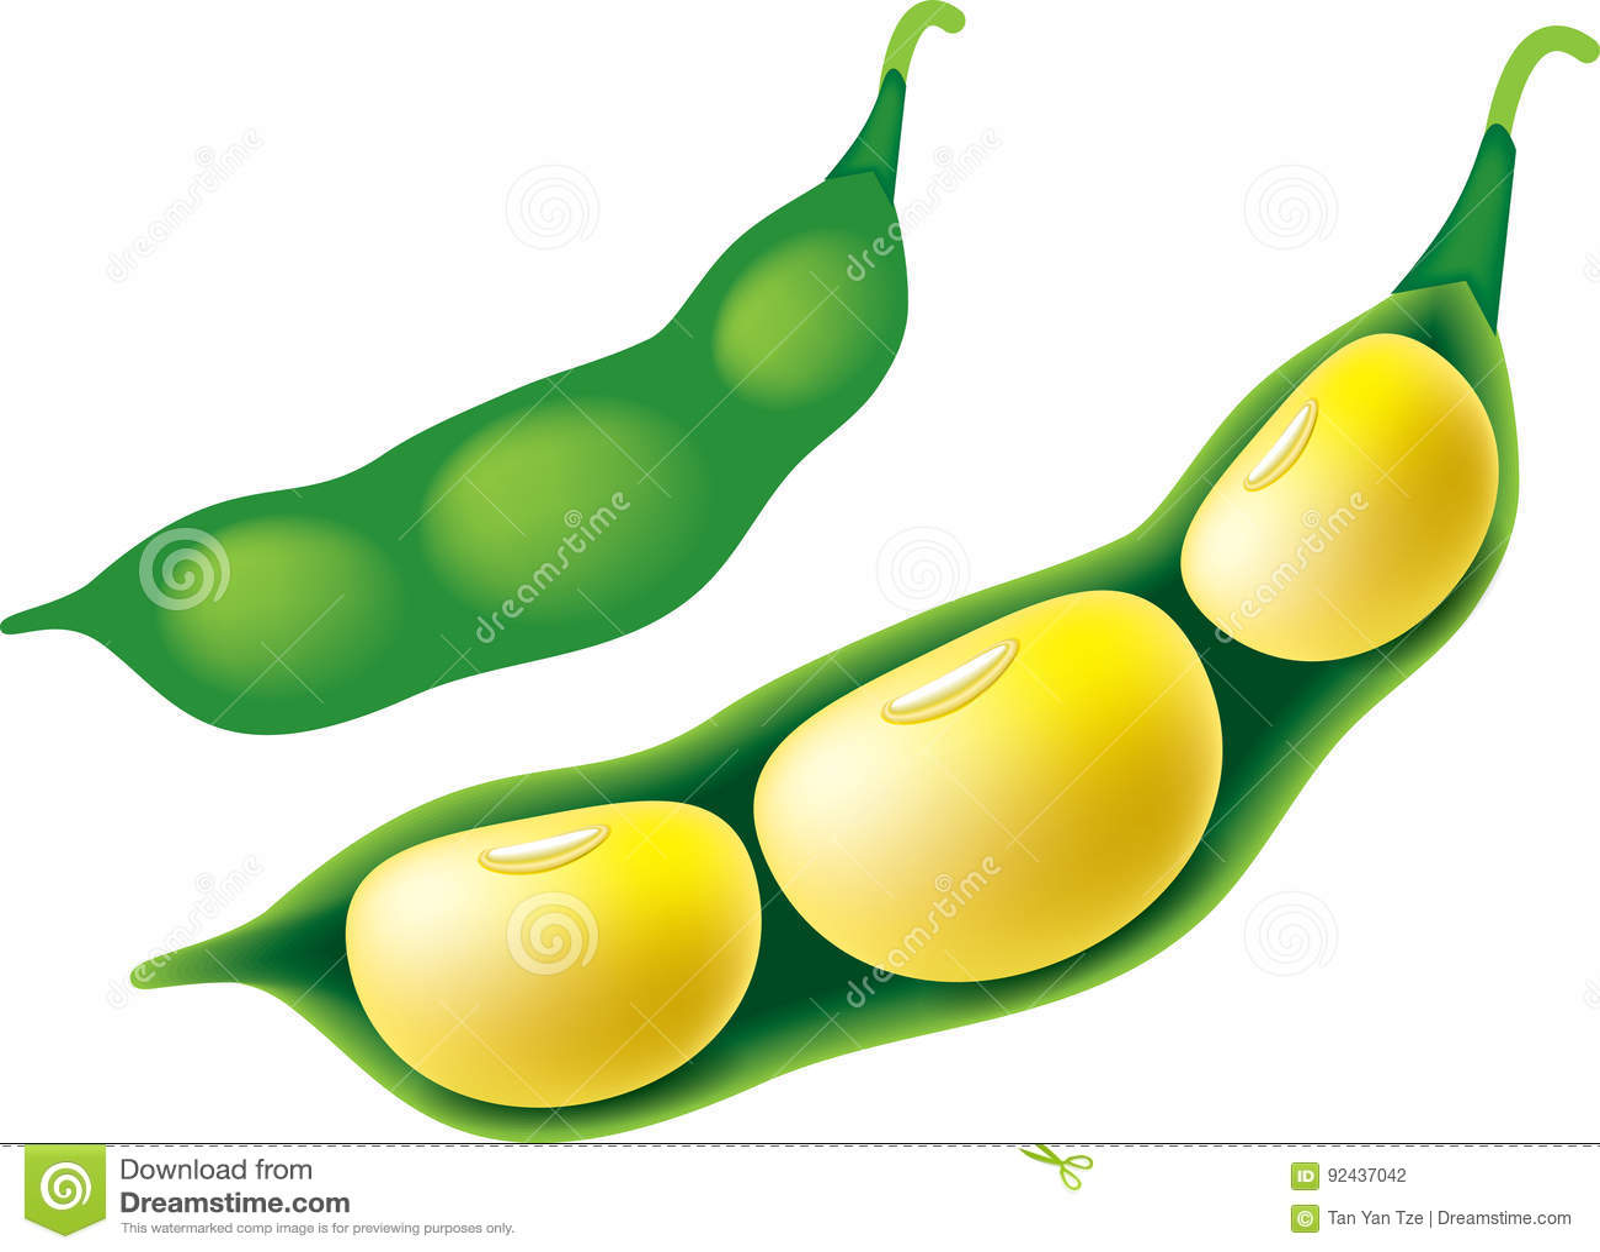 soya bean stock illustration illustration of clipart 92437042 rh dreamstime com soybean clipart black and white Corn Clip Art